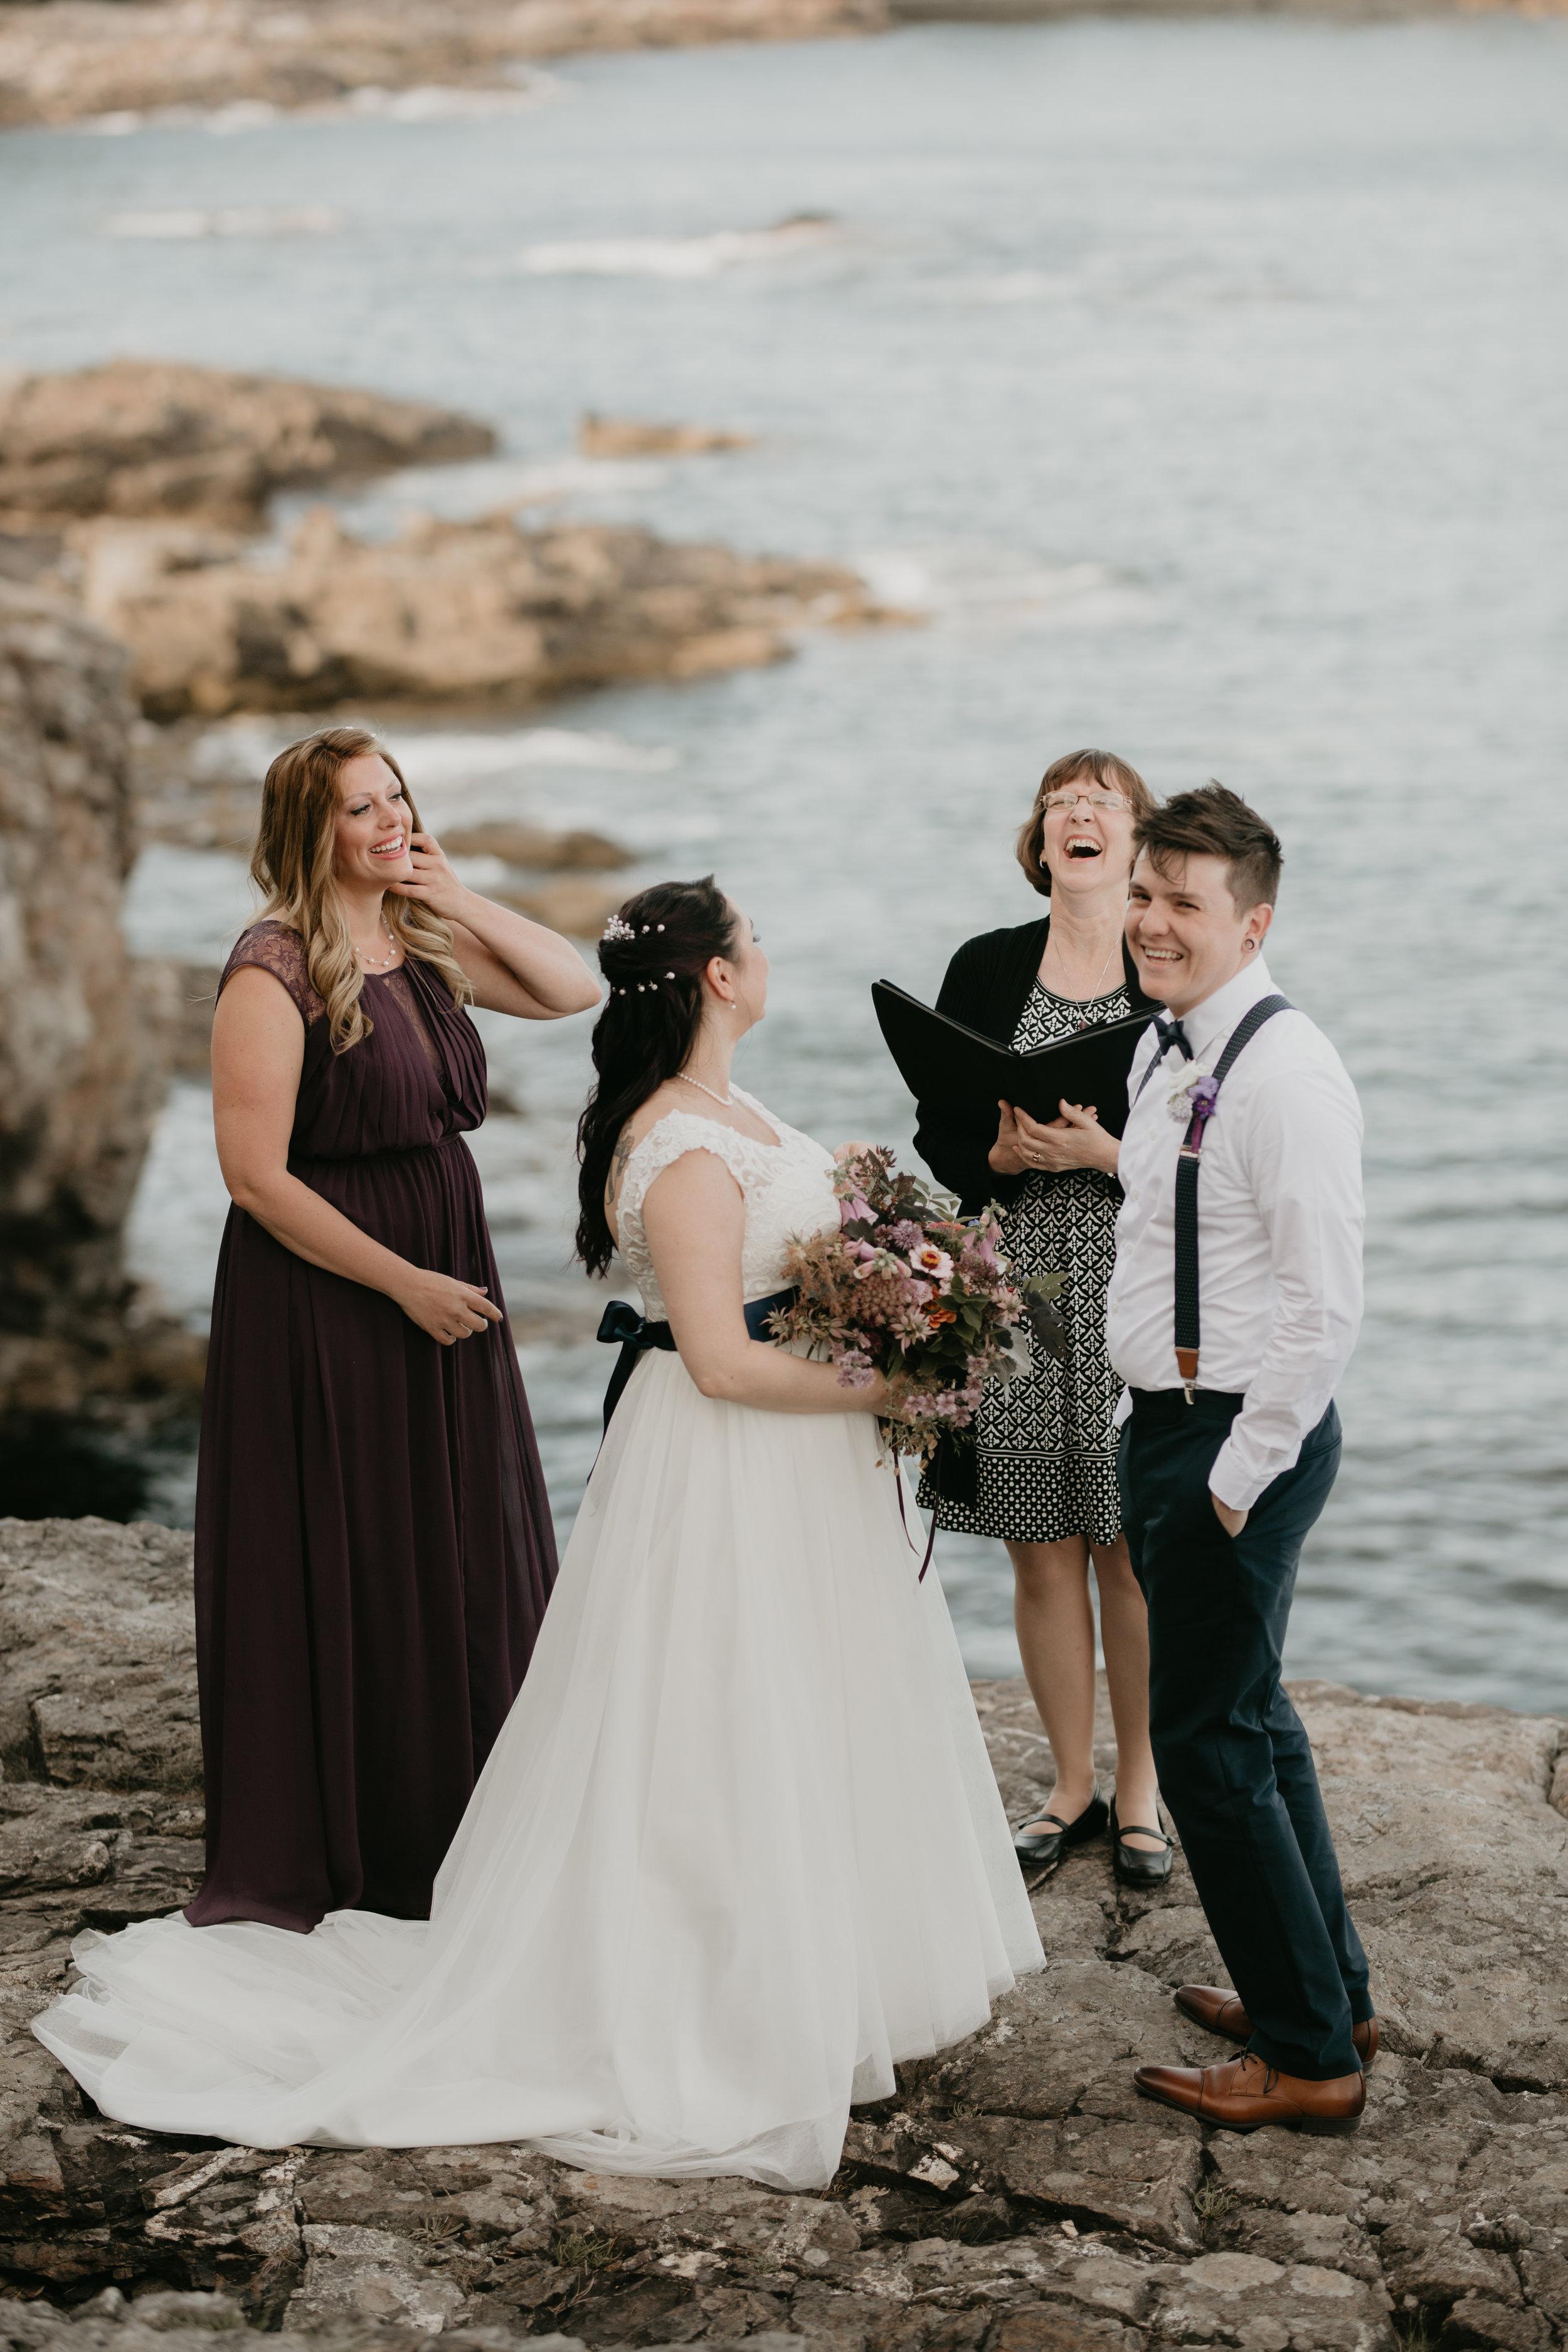 nicole-daacke-photography-Elopement-rocky-shoreline-coast-Acadia-National-Park-elopement-photographer-inspiration-maine-elopement-otter-cliffs-schoonic-head-point-15.jpg